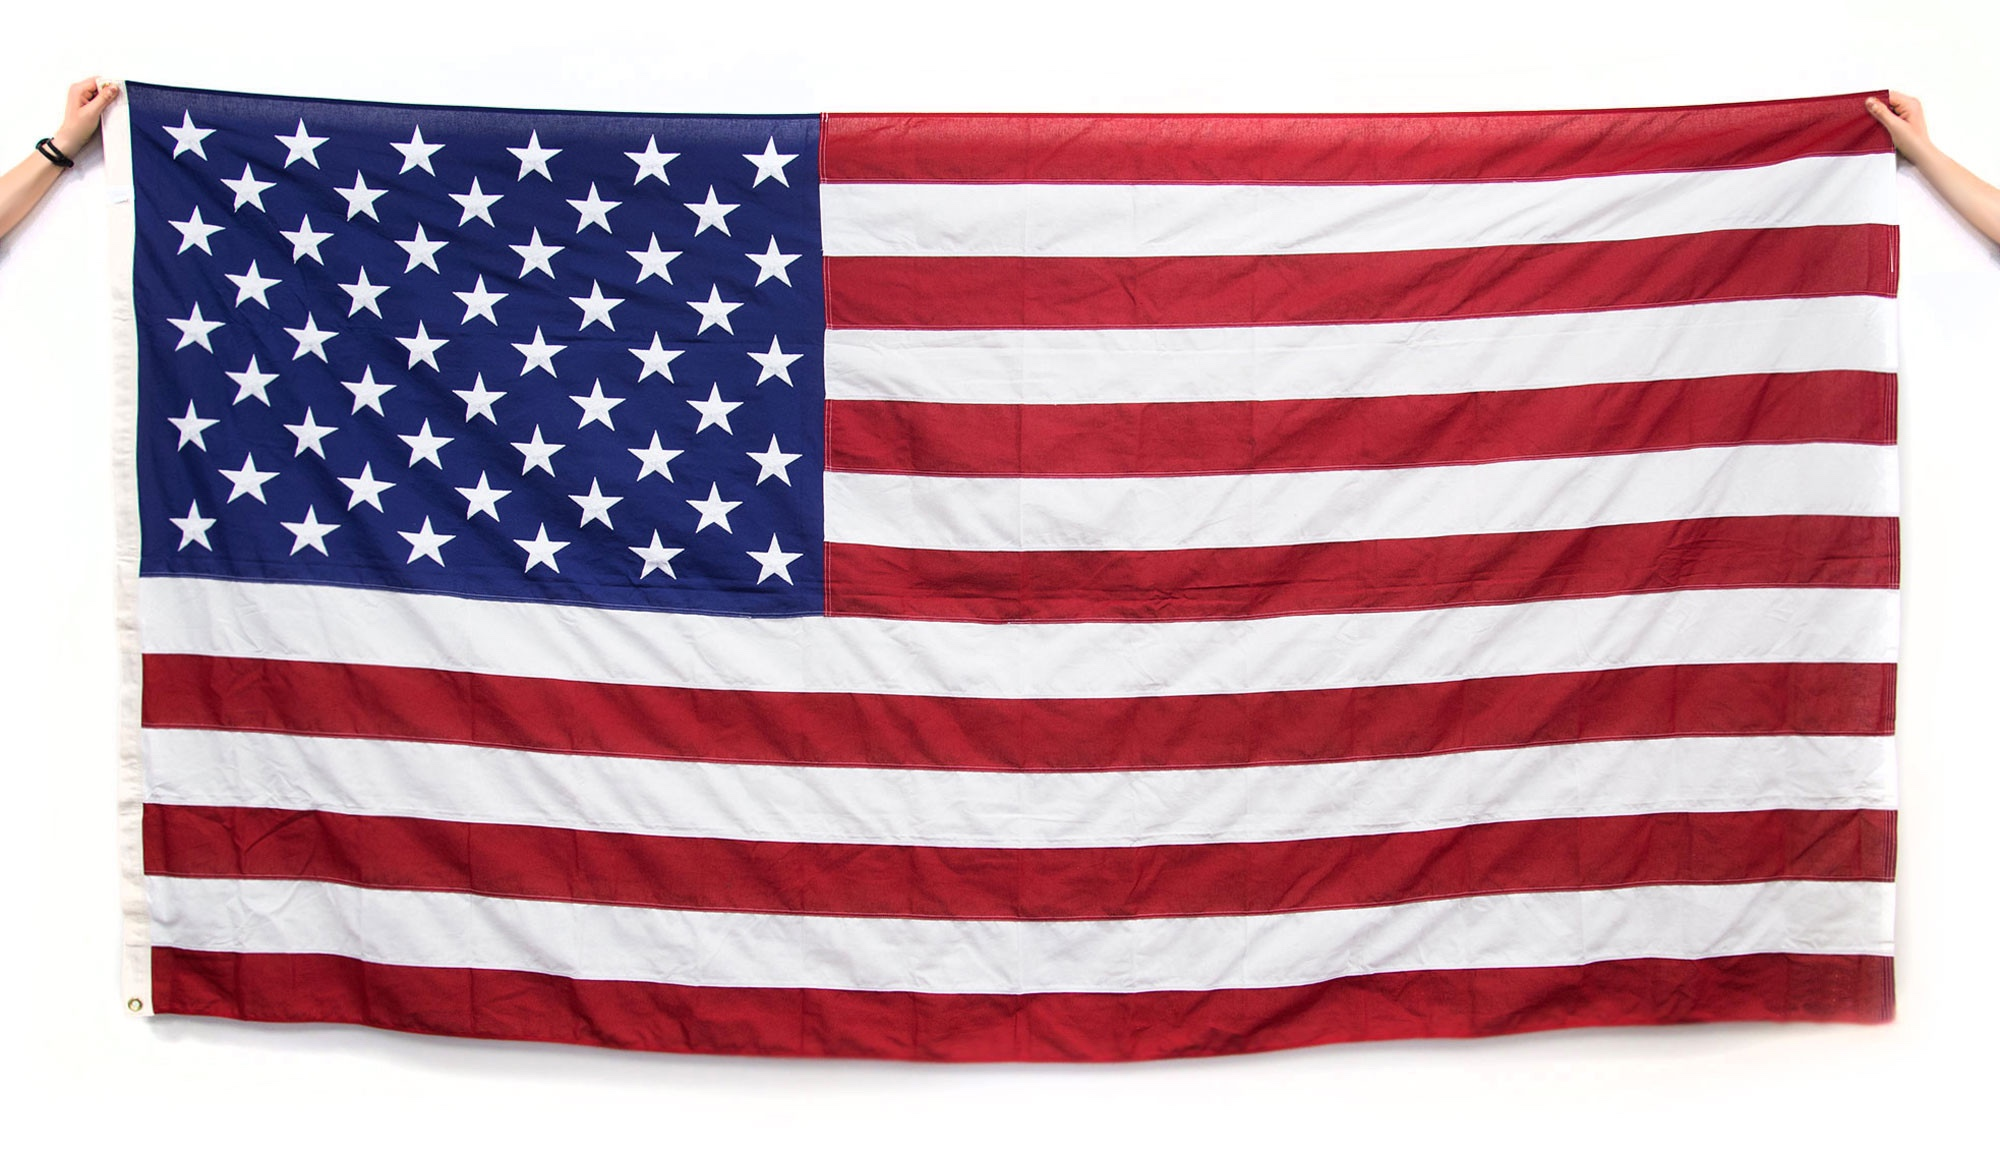 This American Flag ishand sewn in the USA by All Seasons Apparel.Image© Shinola 2016.